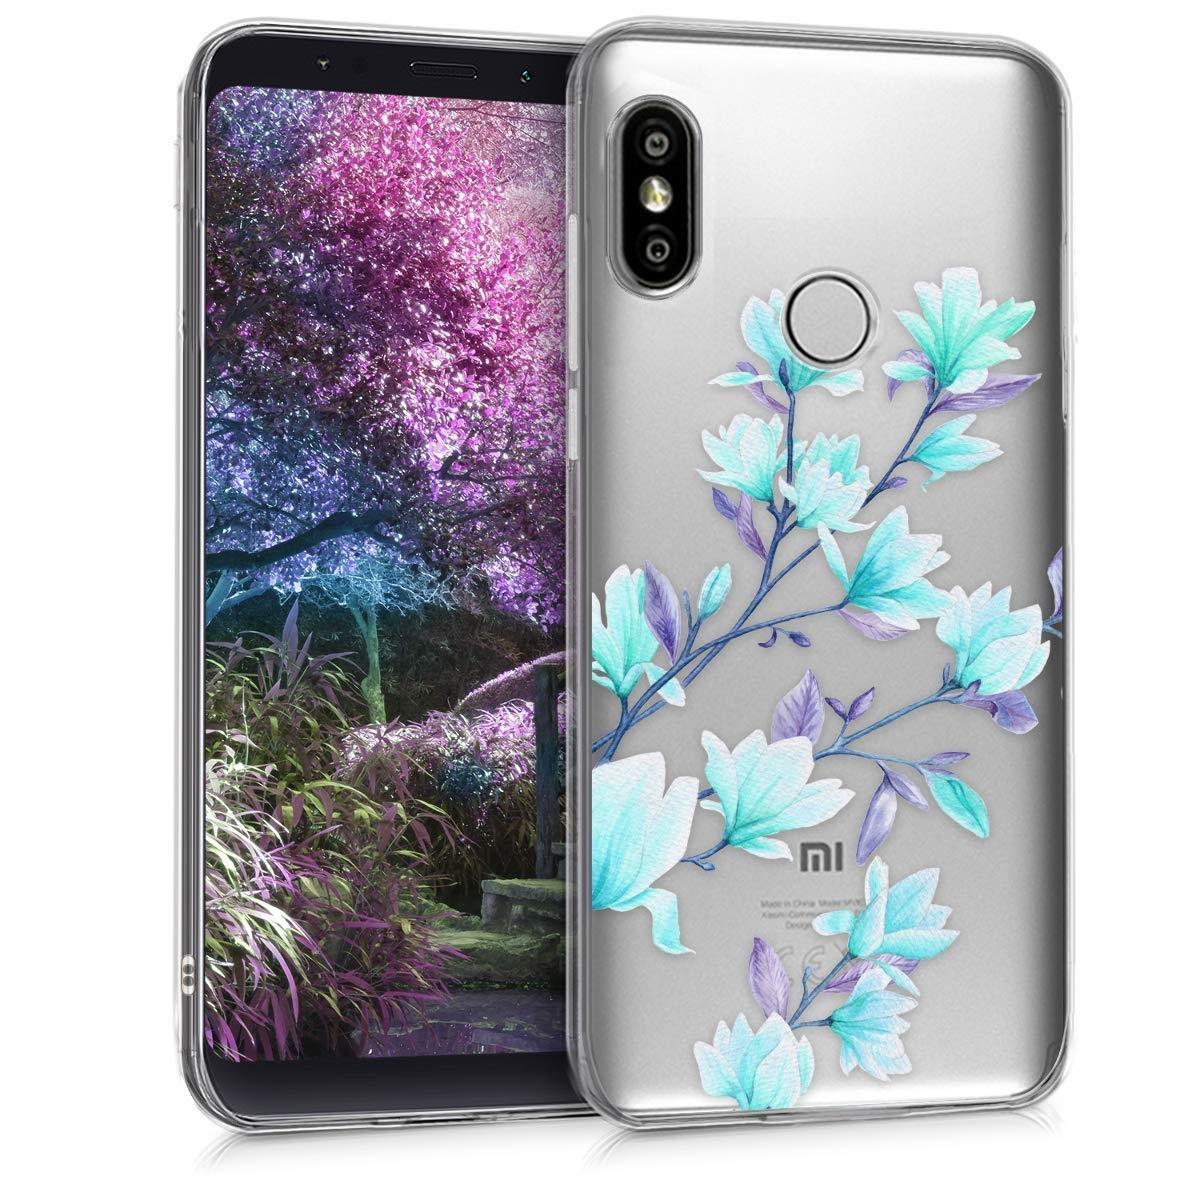 KW Θήκη Σιλικόνης Xiaomi Redmi S2 - Magnolias Blue Violet (45880.01)